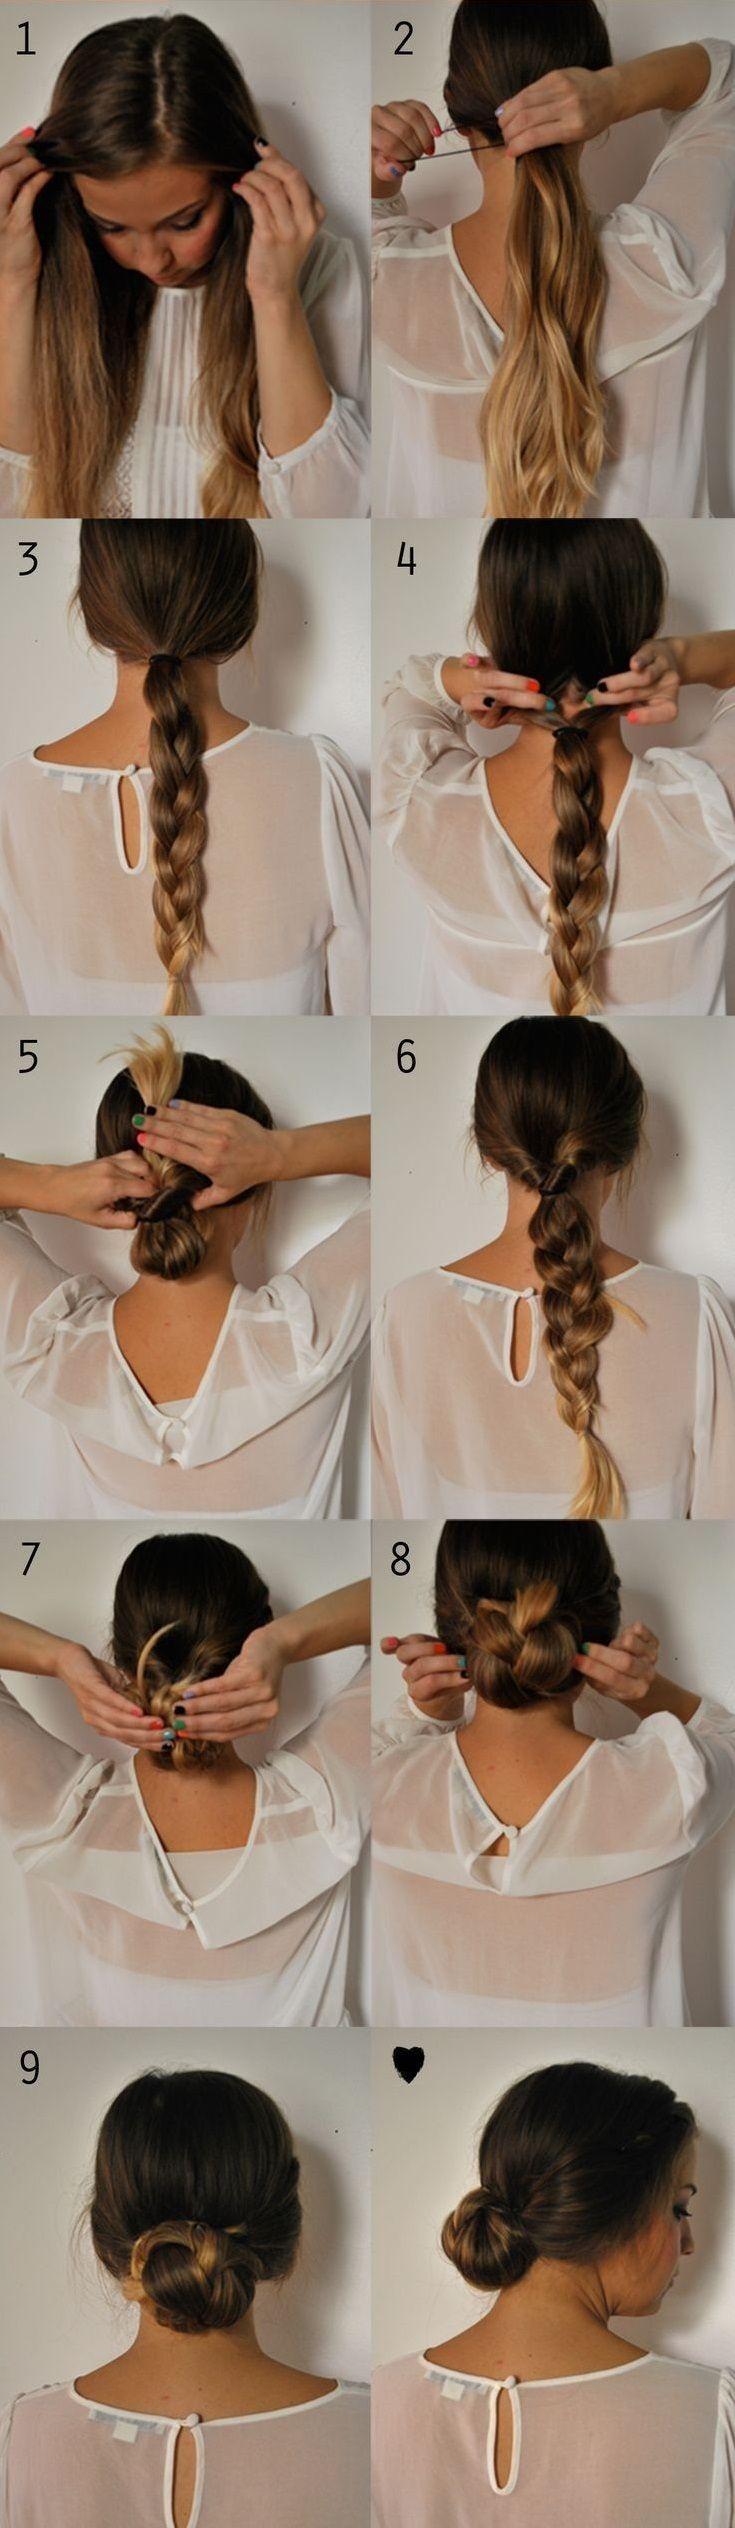 cute hairstyles for school hair ideas pinterest school